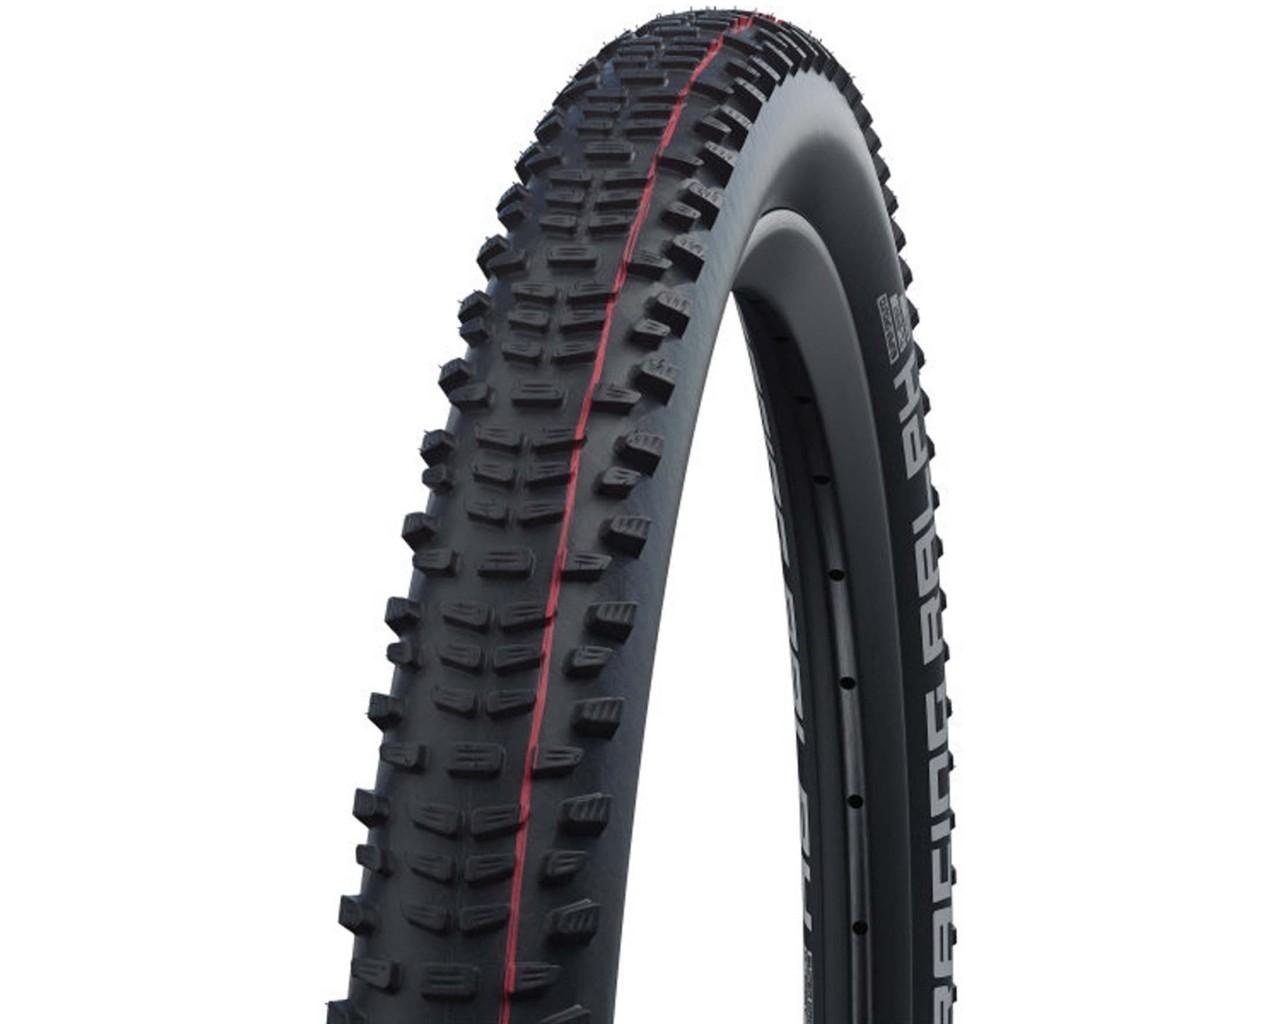 Schwalbe Racing Ralph MTB-Reifen 27.5x2.25 Zoll   black ADDIX Speed Evolution Line faltbar